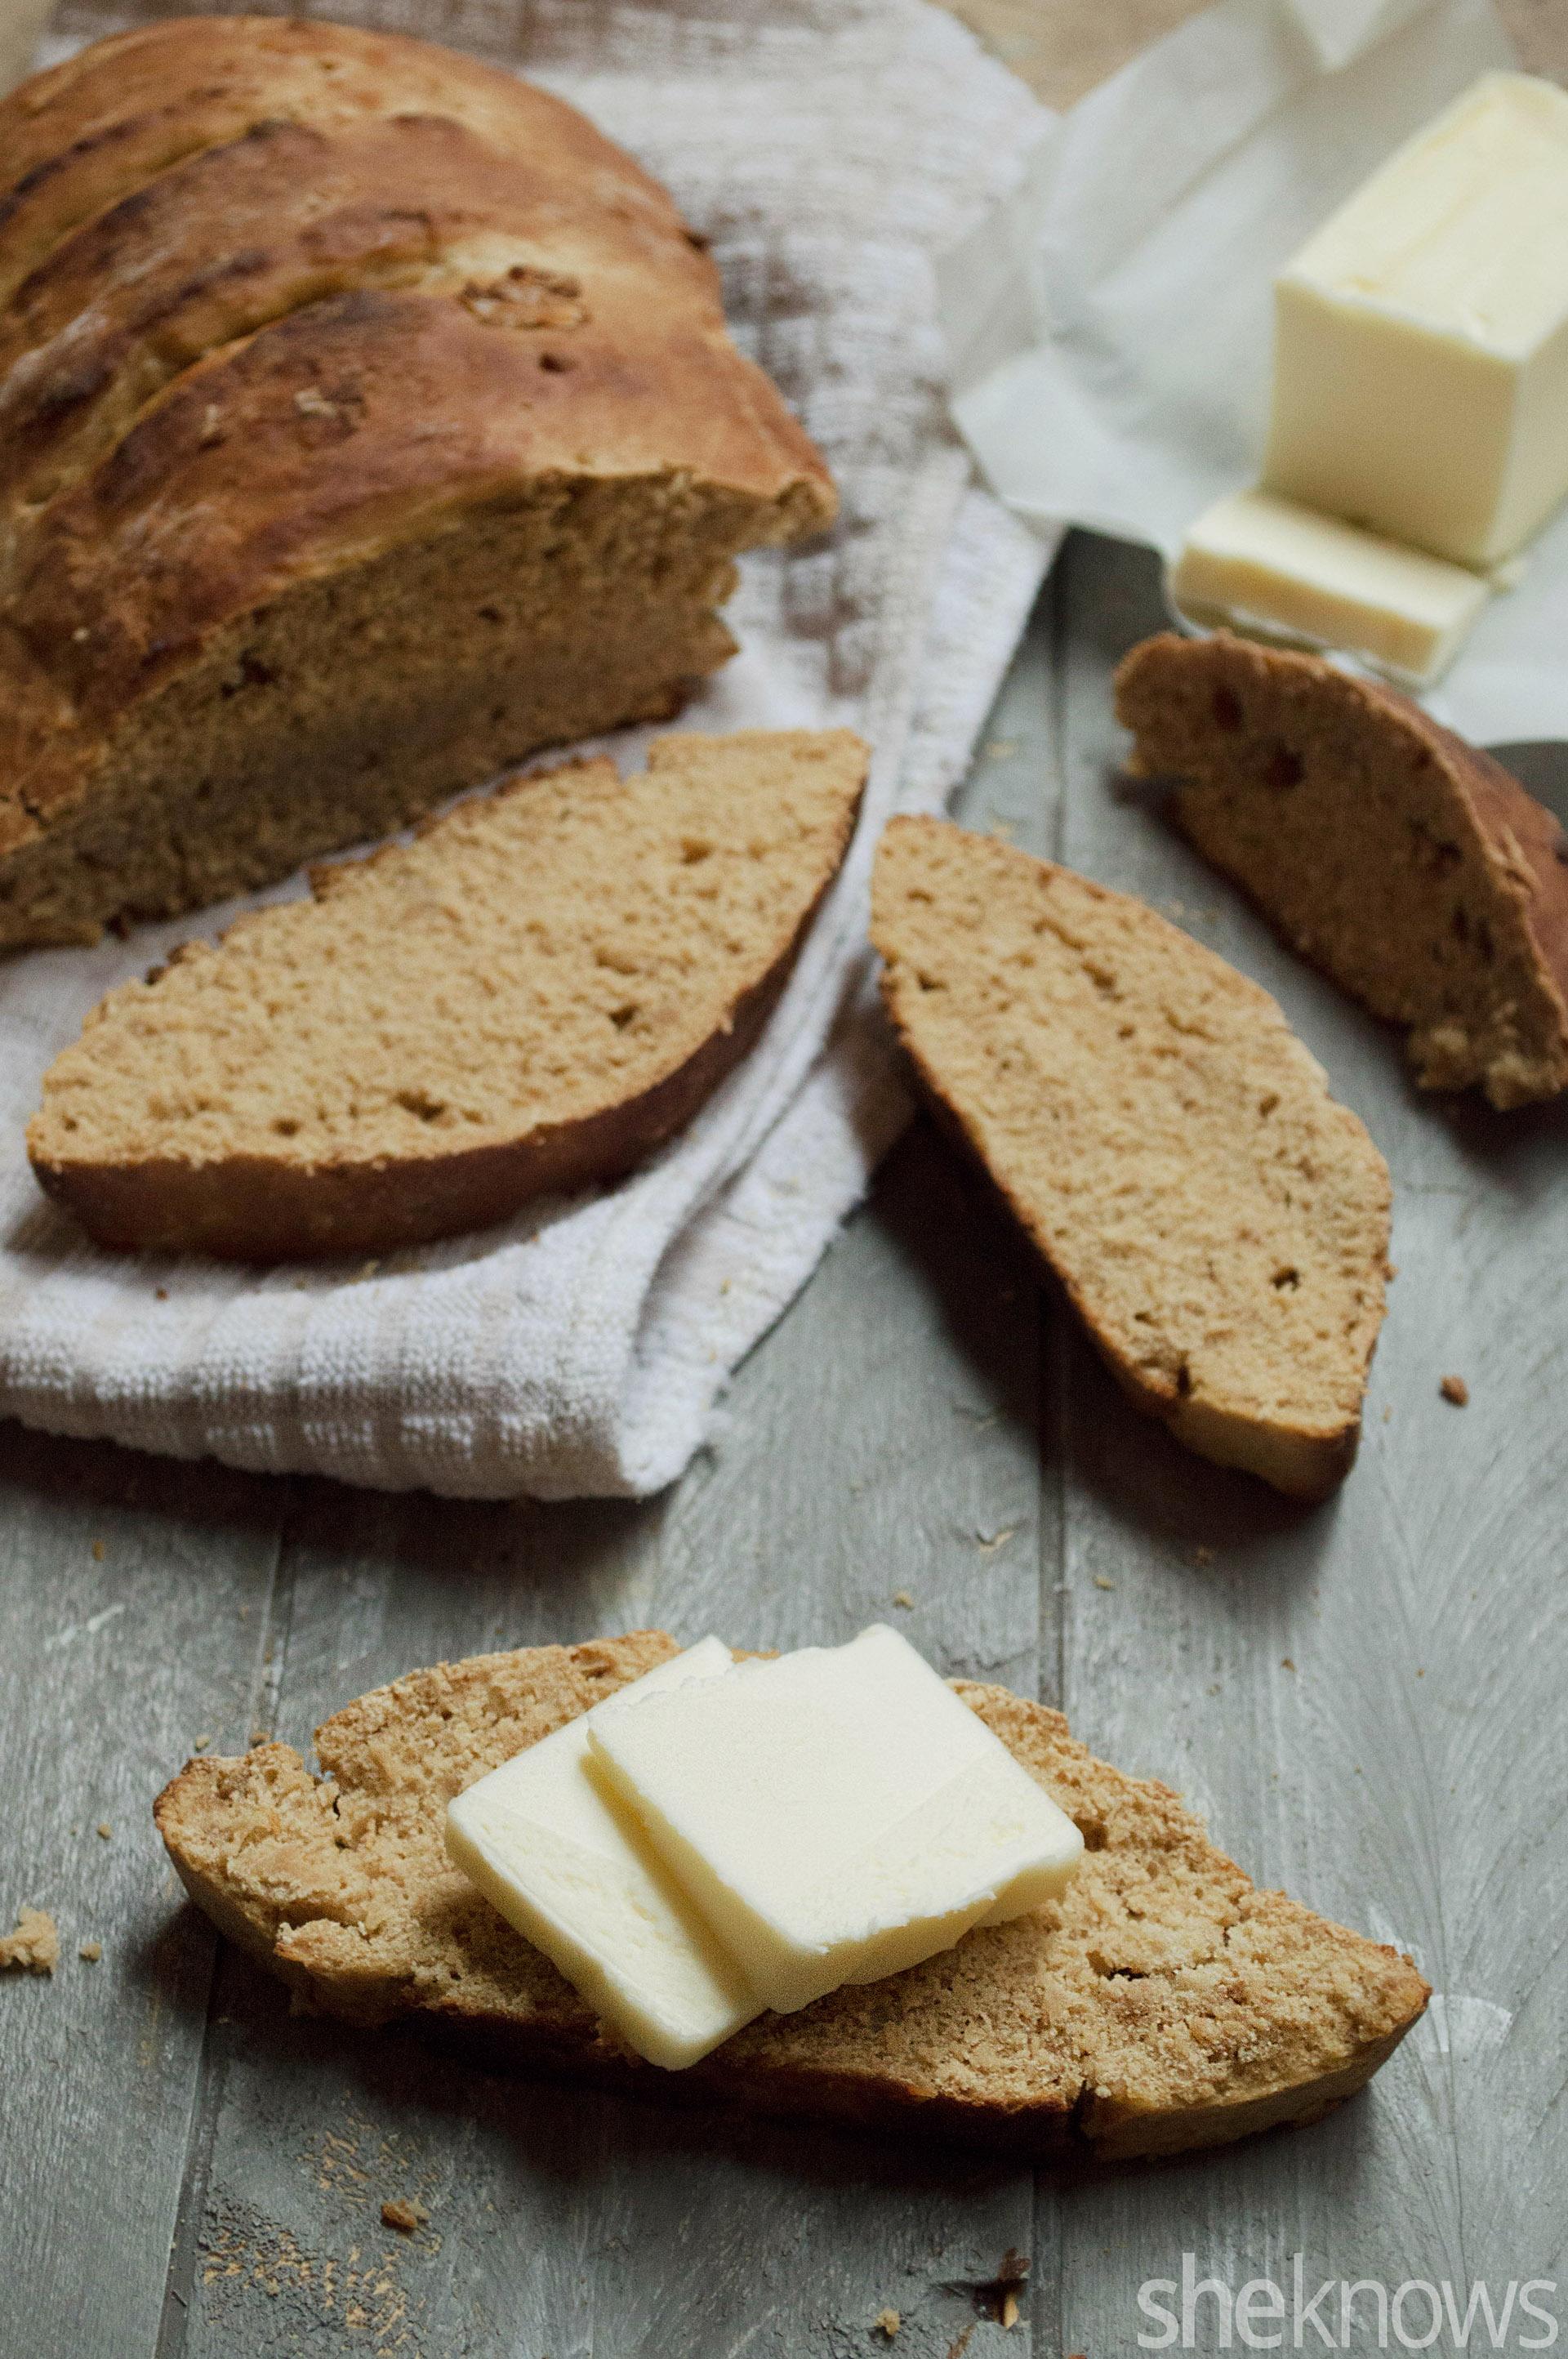 homemade molasses bread